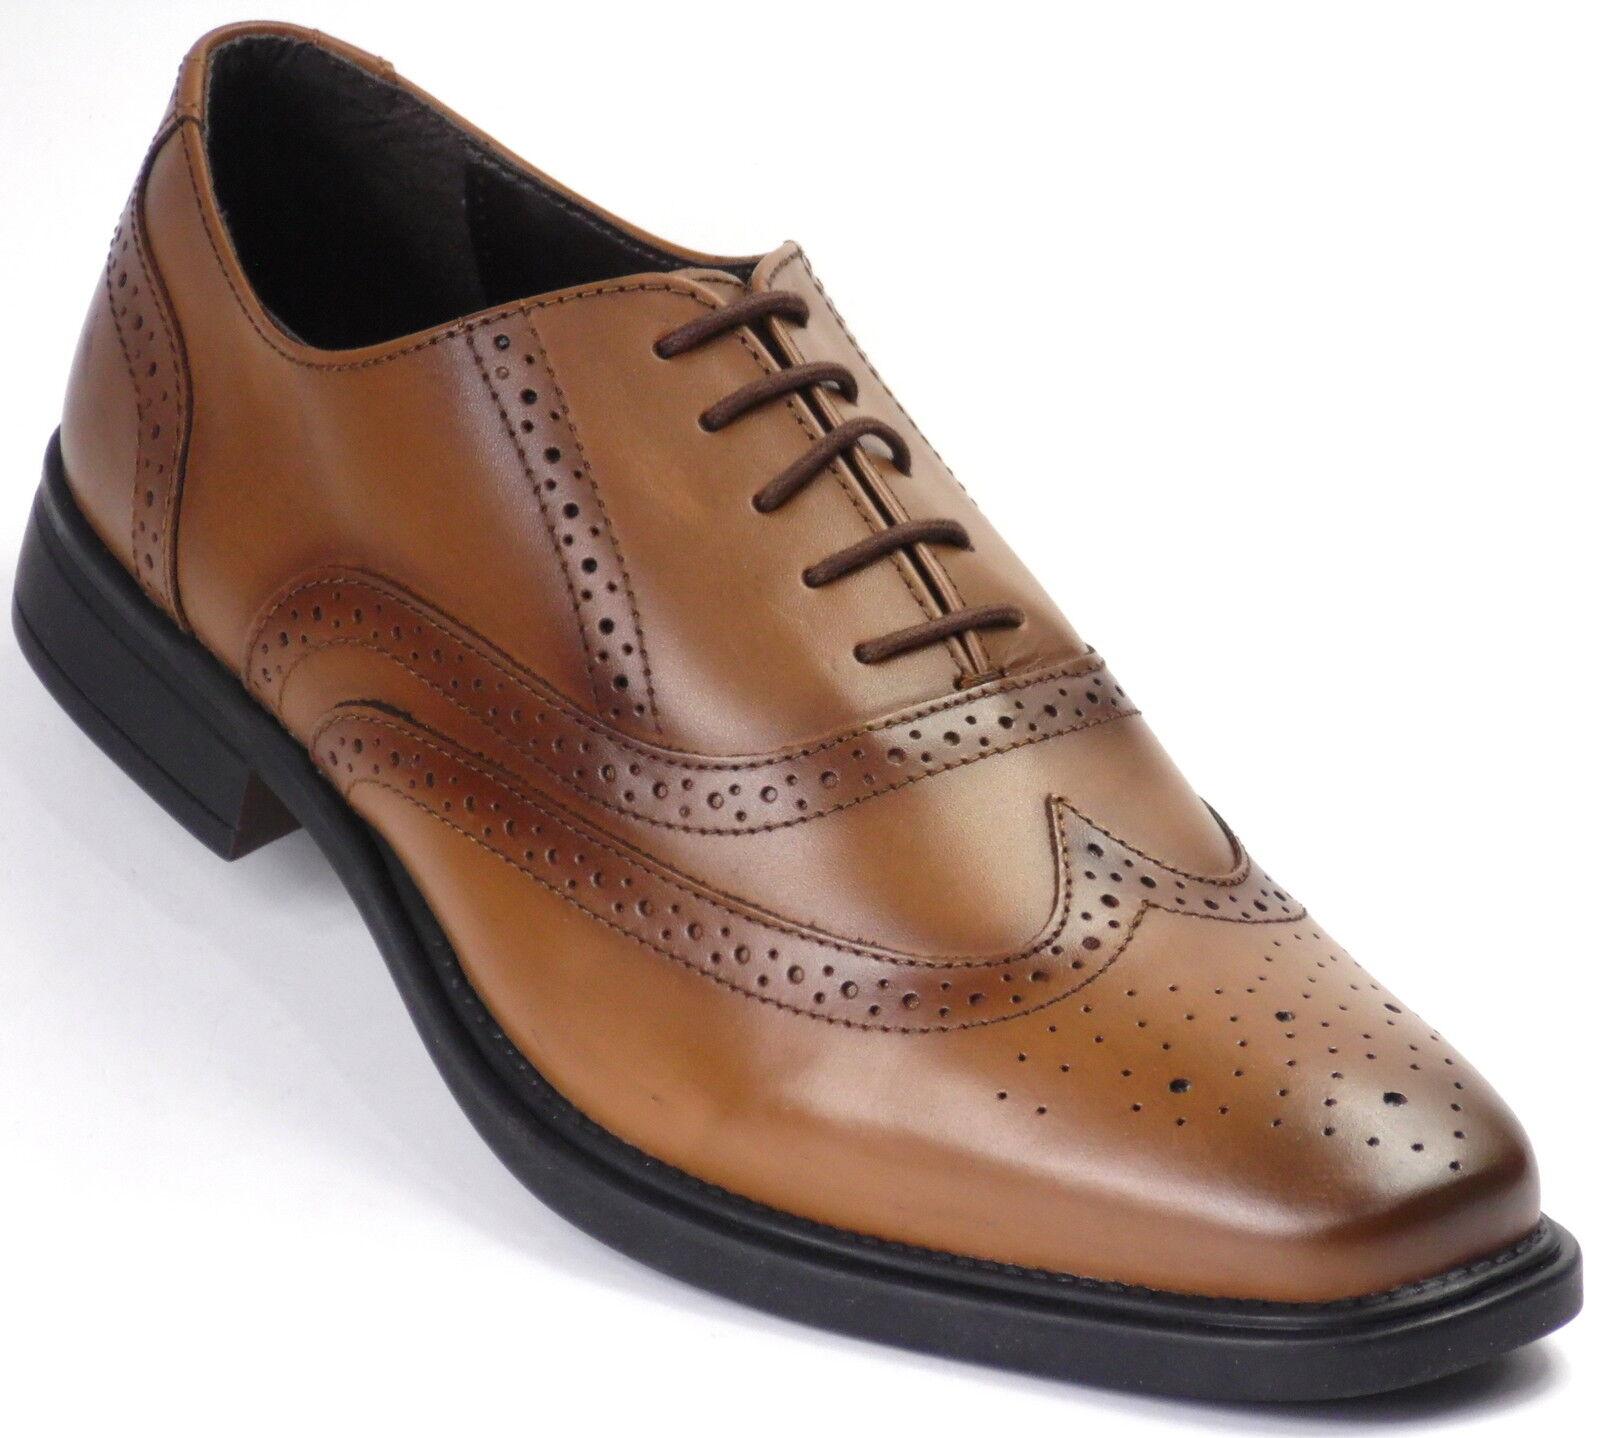 Shoeprimo Oxford Brogue Shoes Tan UVP 180 Leder Business Schuhe Halbschuhe 01